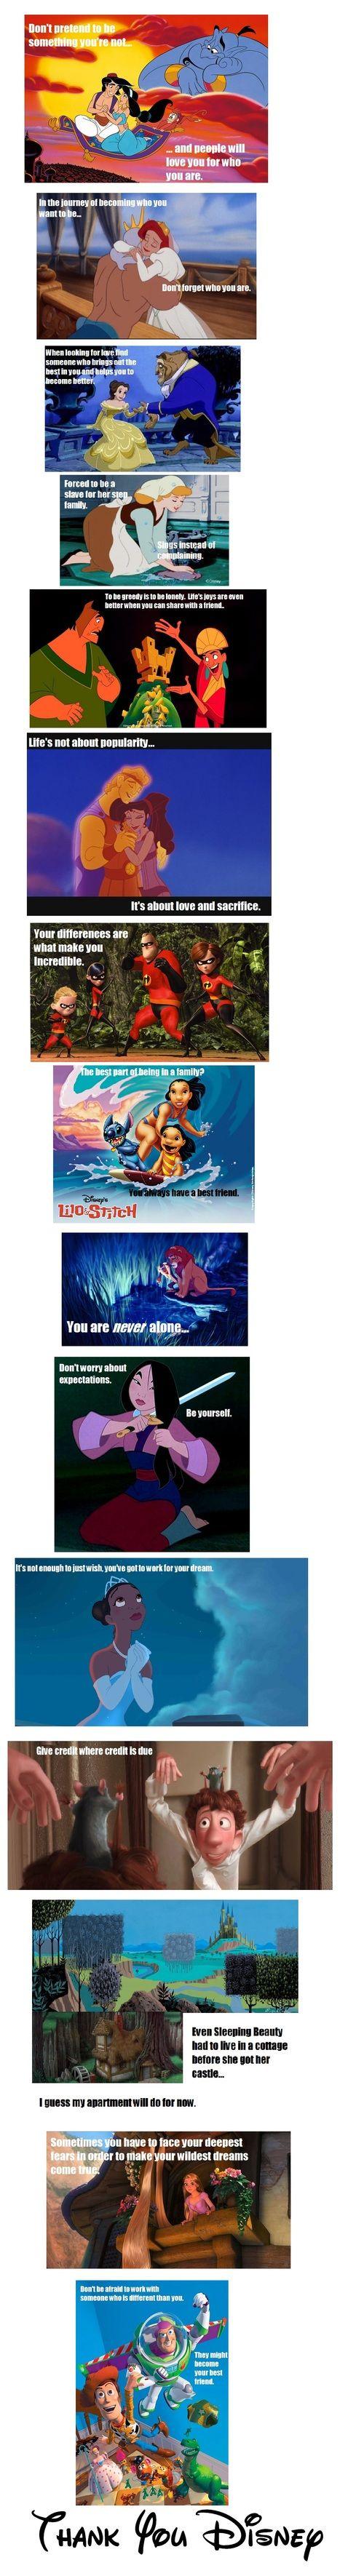 Thank you, Disney!